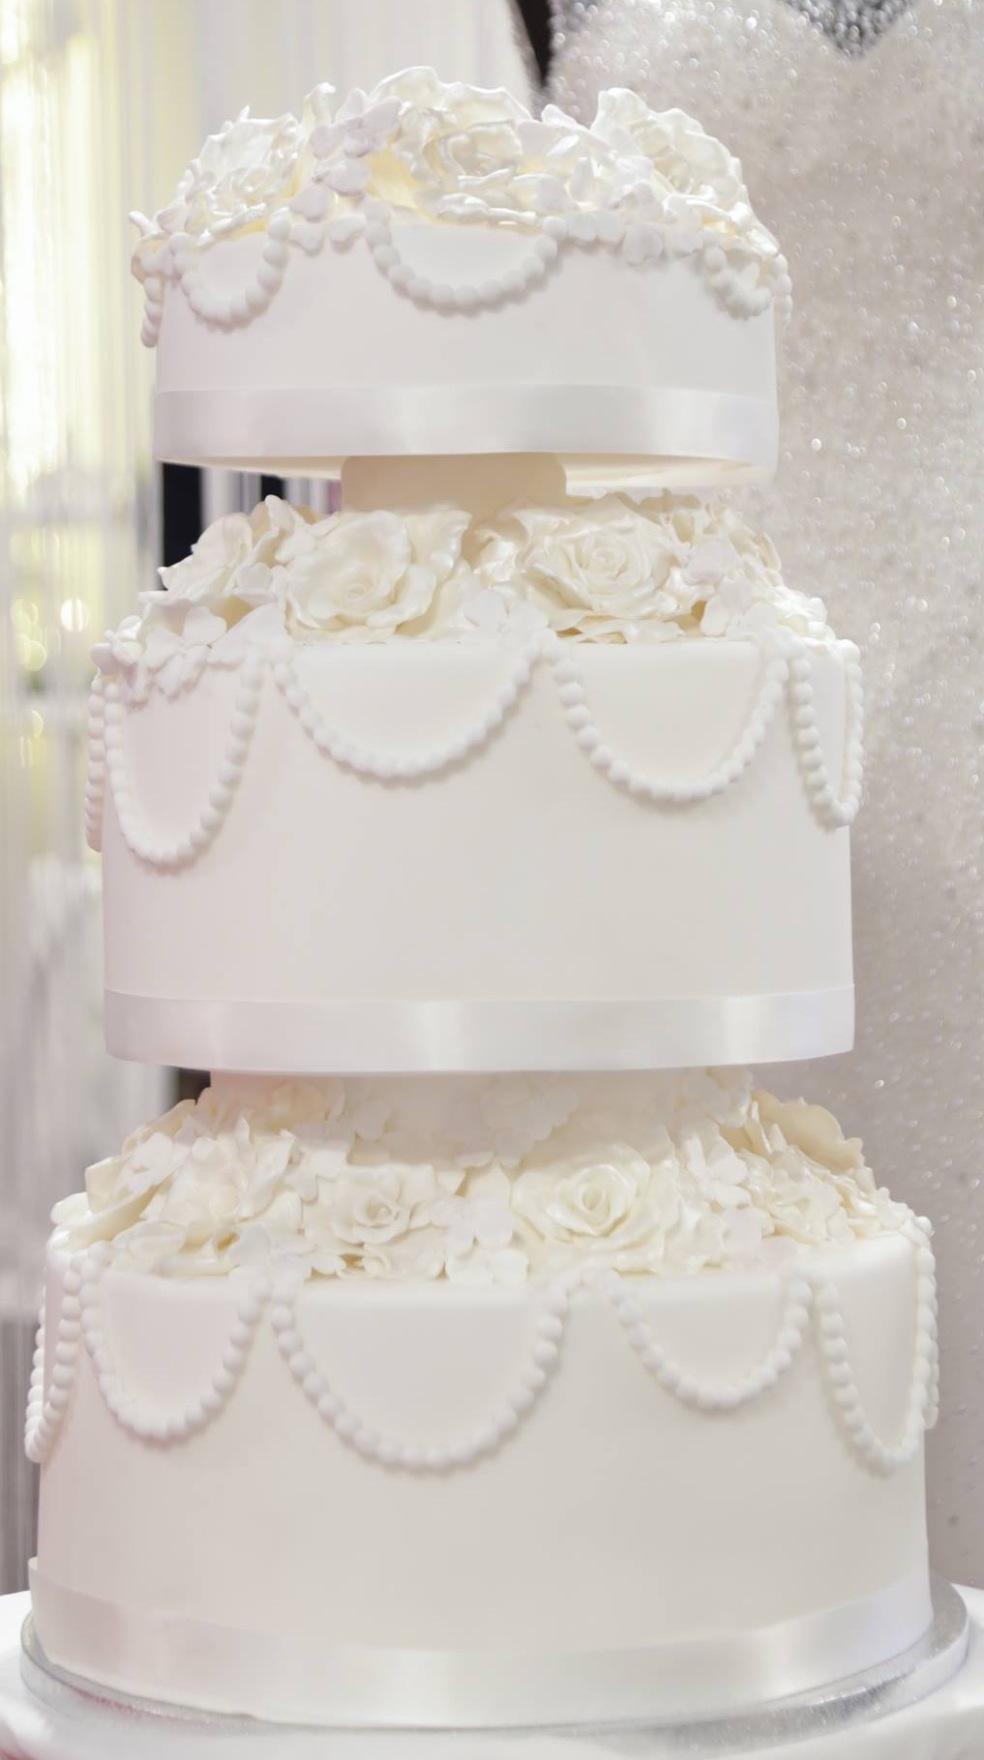 Mariage Montecarlo Wedding Cake Luxury 1.PNG